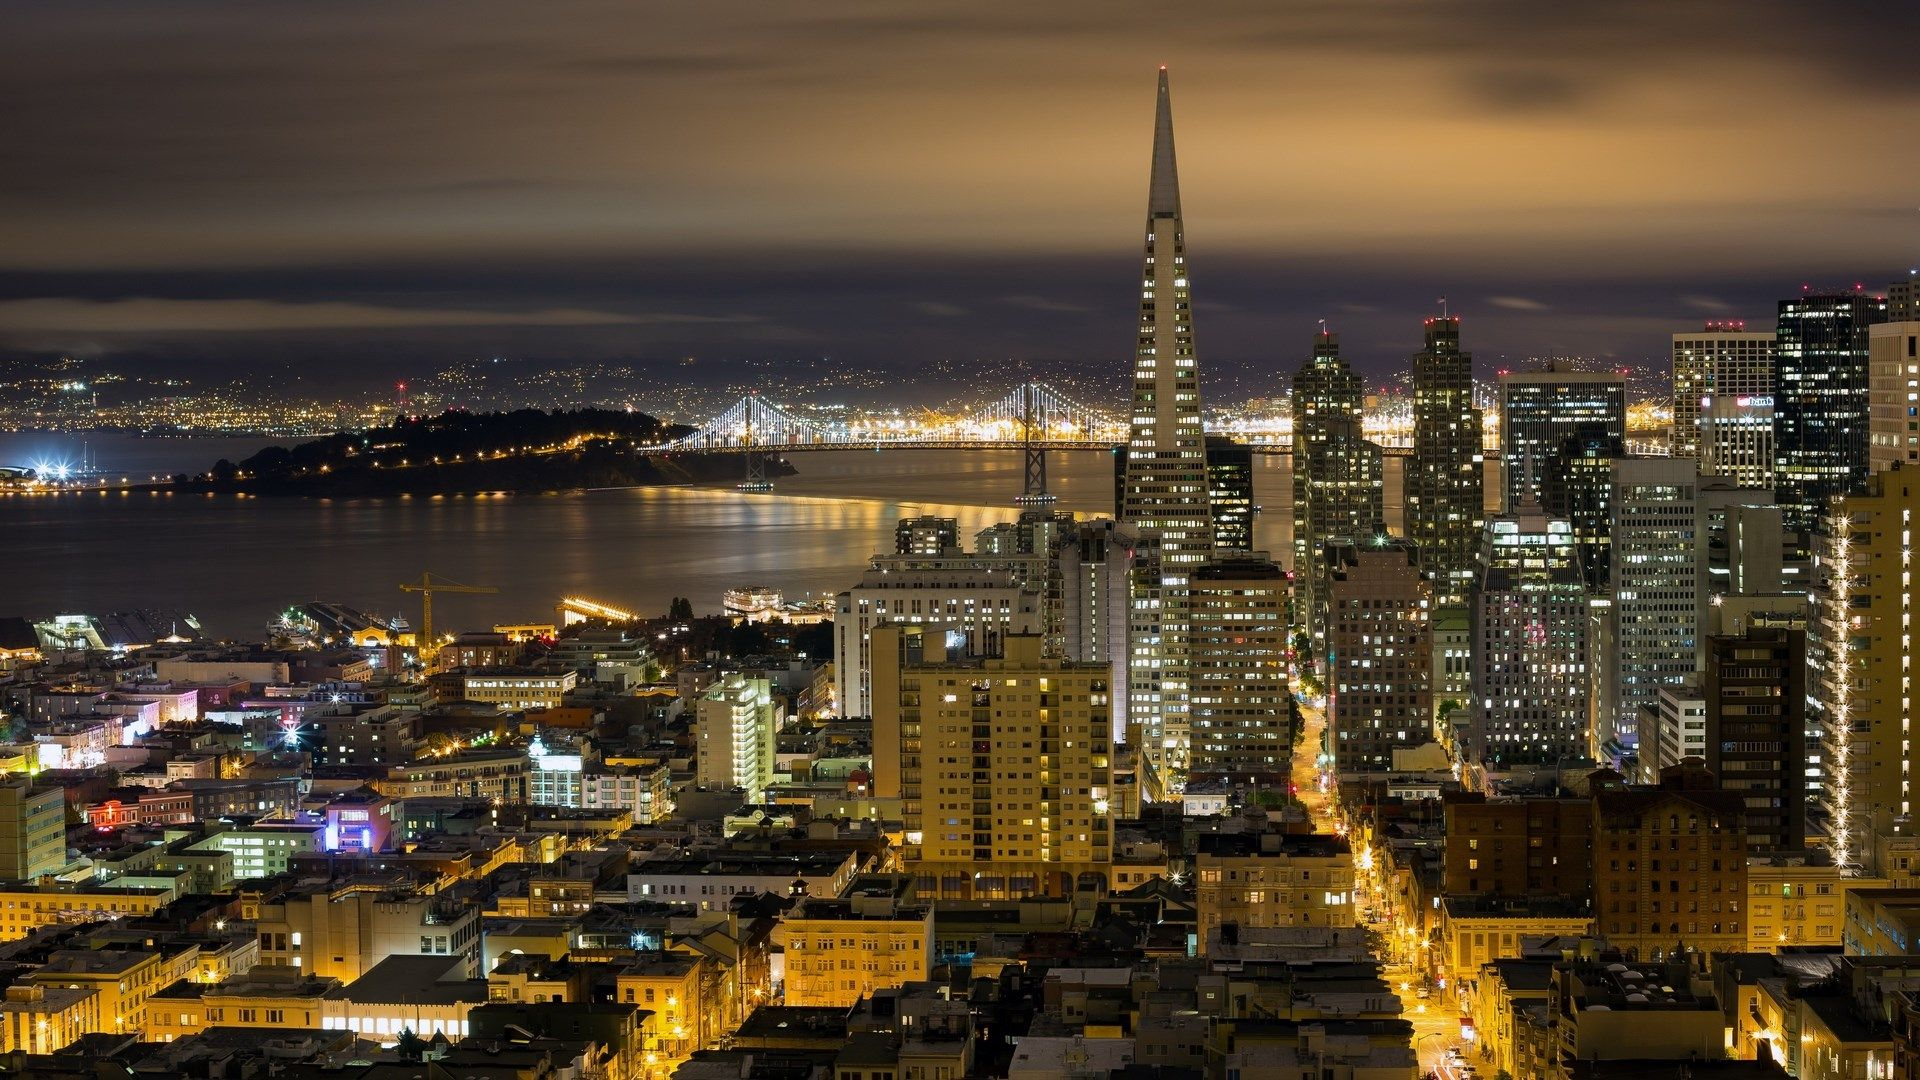 1920x1080 Free High Resolution Wallpaper San Francisco San Francisco At Night San Francisco Wallpaper San Francisco Streets